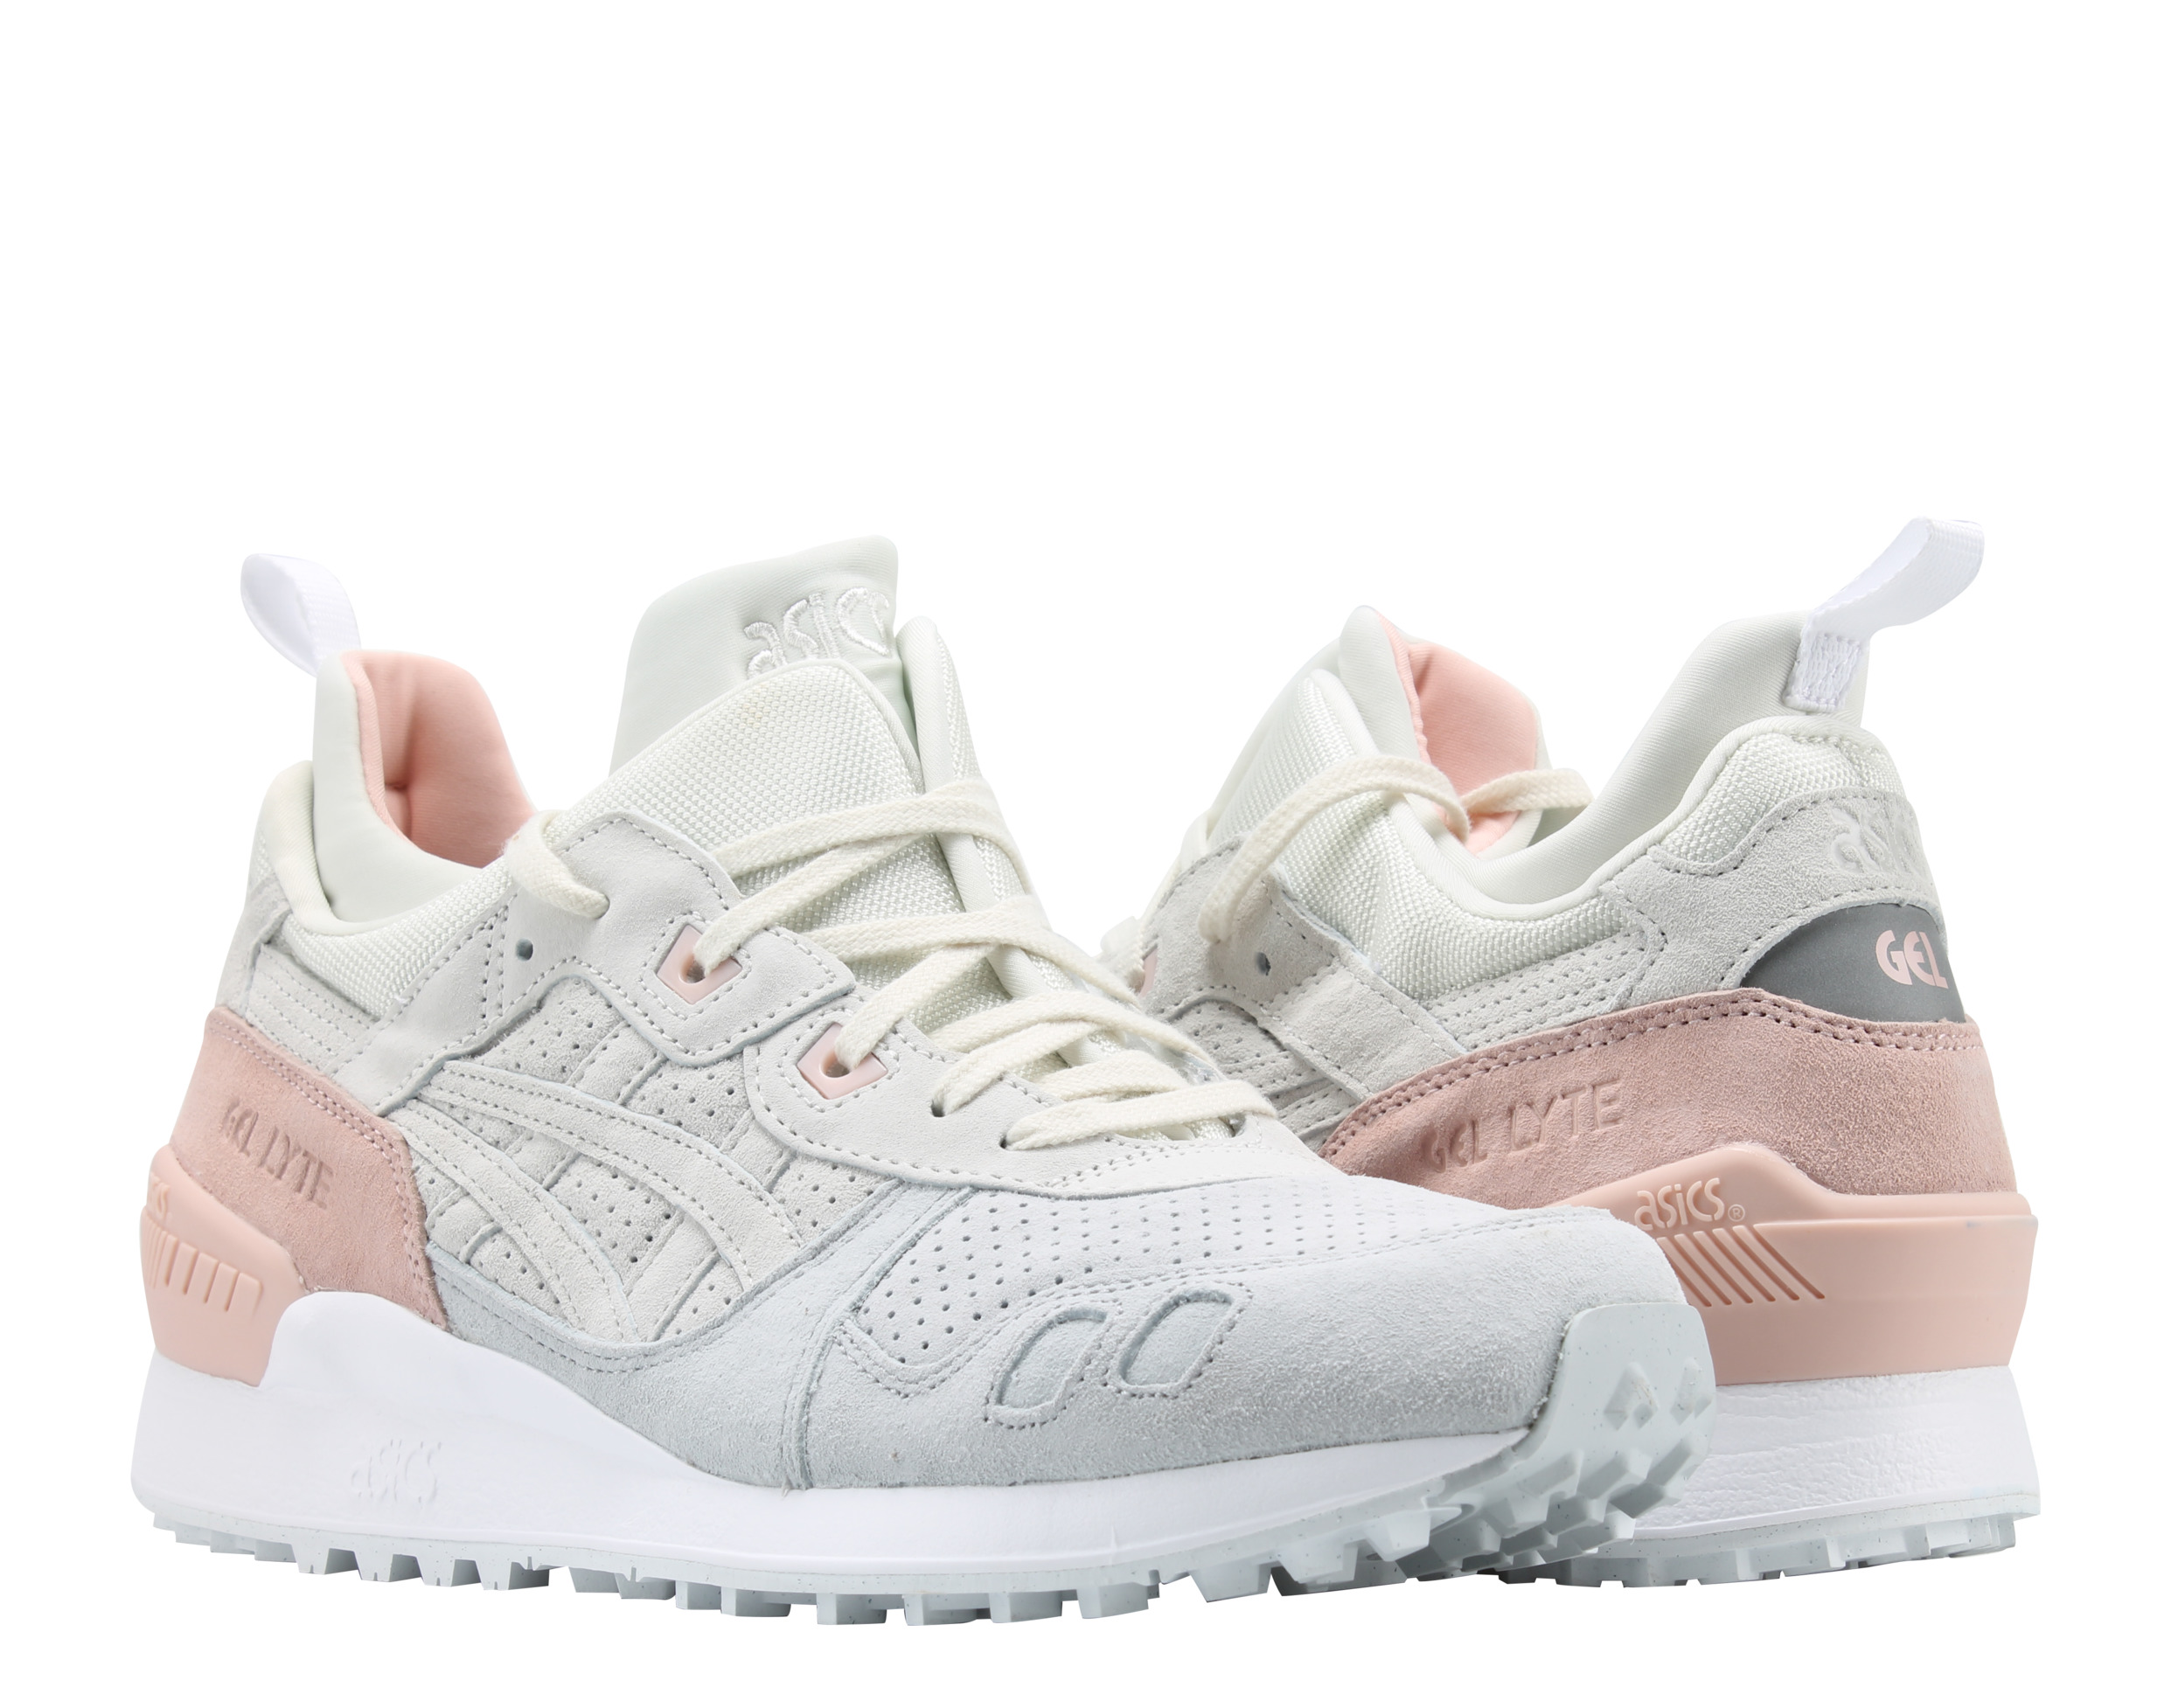 Asics Gel-Lyte MT Cream/Pink Salmon Mid-Cut Men's Running Shoes HL7Z1-0000